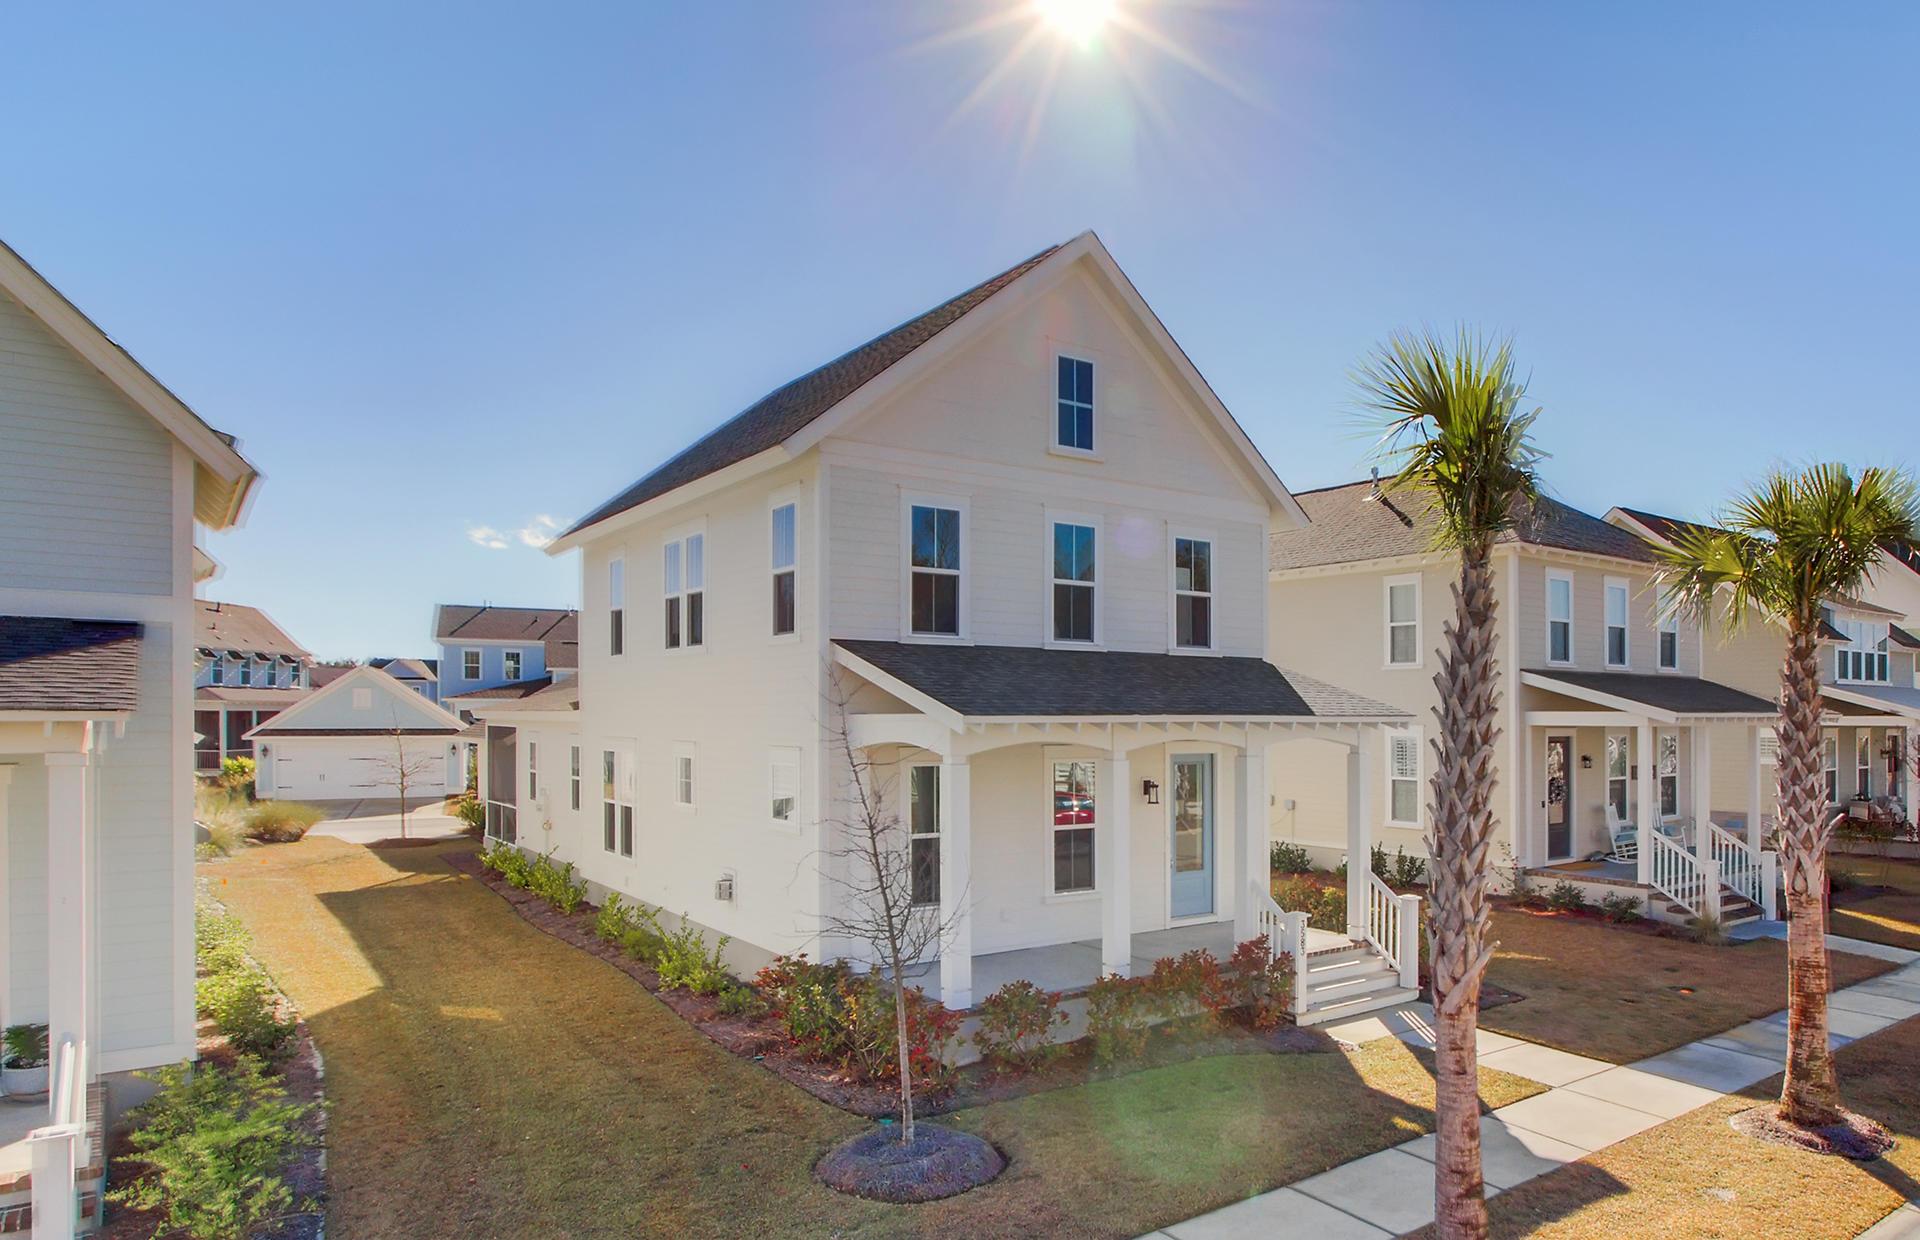 Carolina Park Homes For Sale - 3583 Backshore, Mount Pleasant, SC - 3